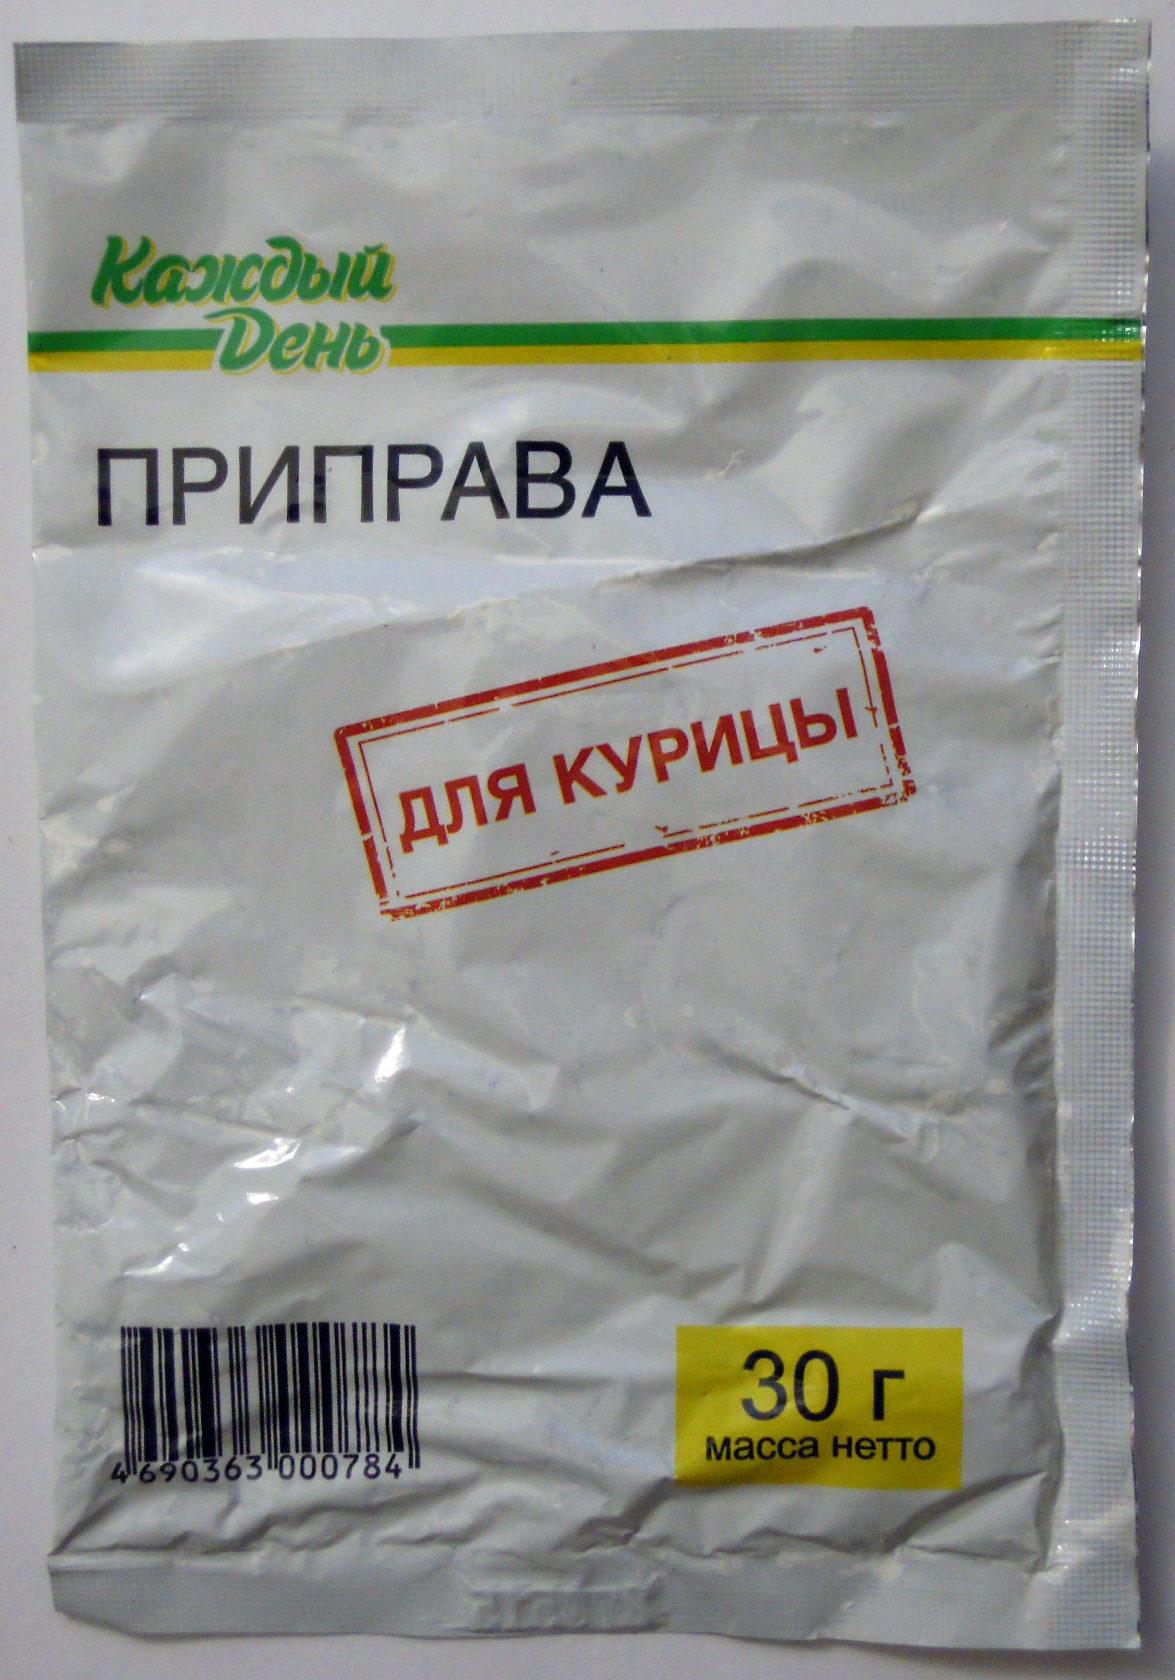 Приправа для курицы - Product - ru